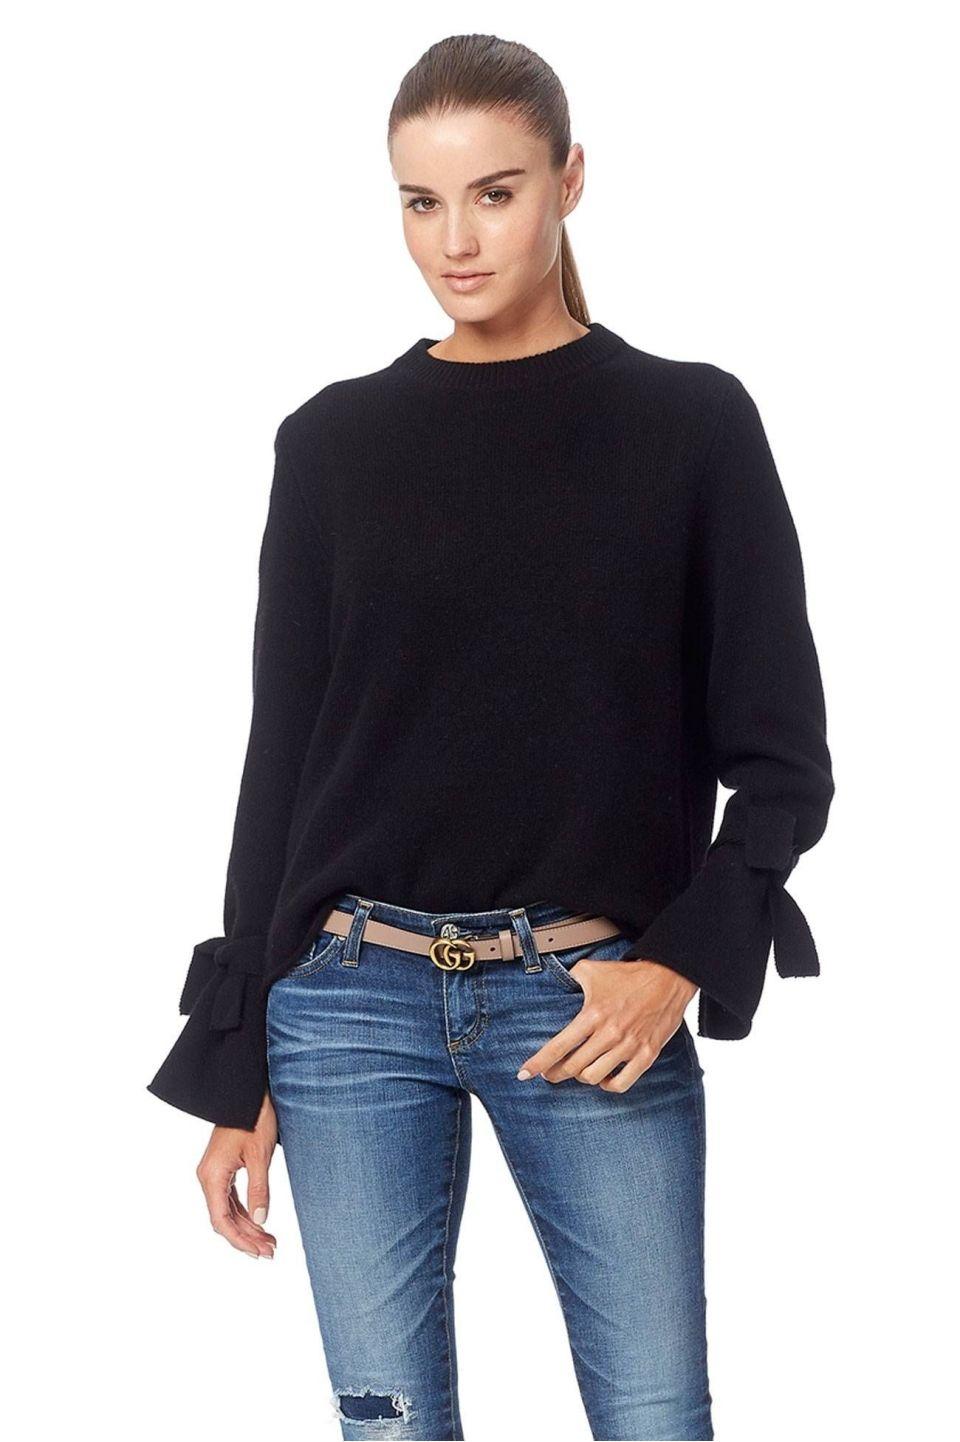 360 Cashmere Erika Sweater   Black or Burgundy